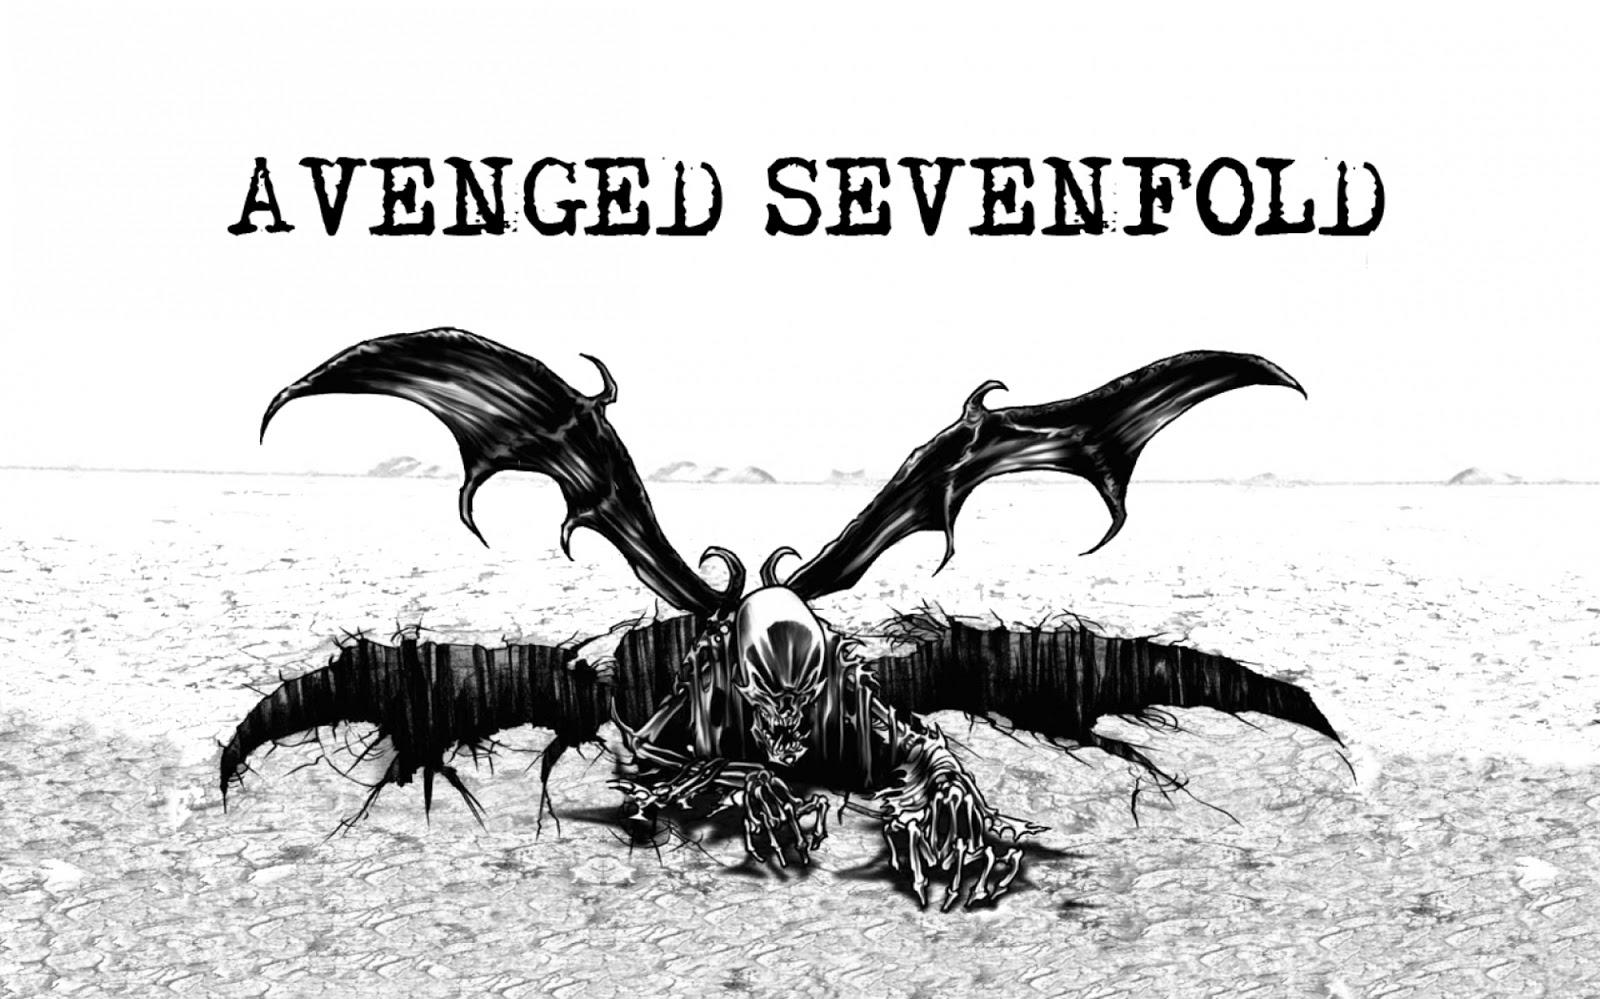 avenged sevenfold wallpaper perfect wallpaper